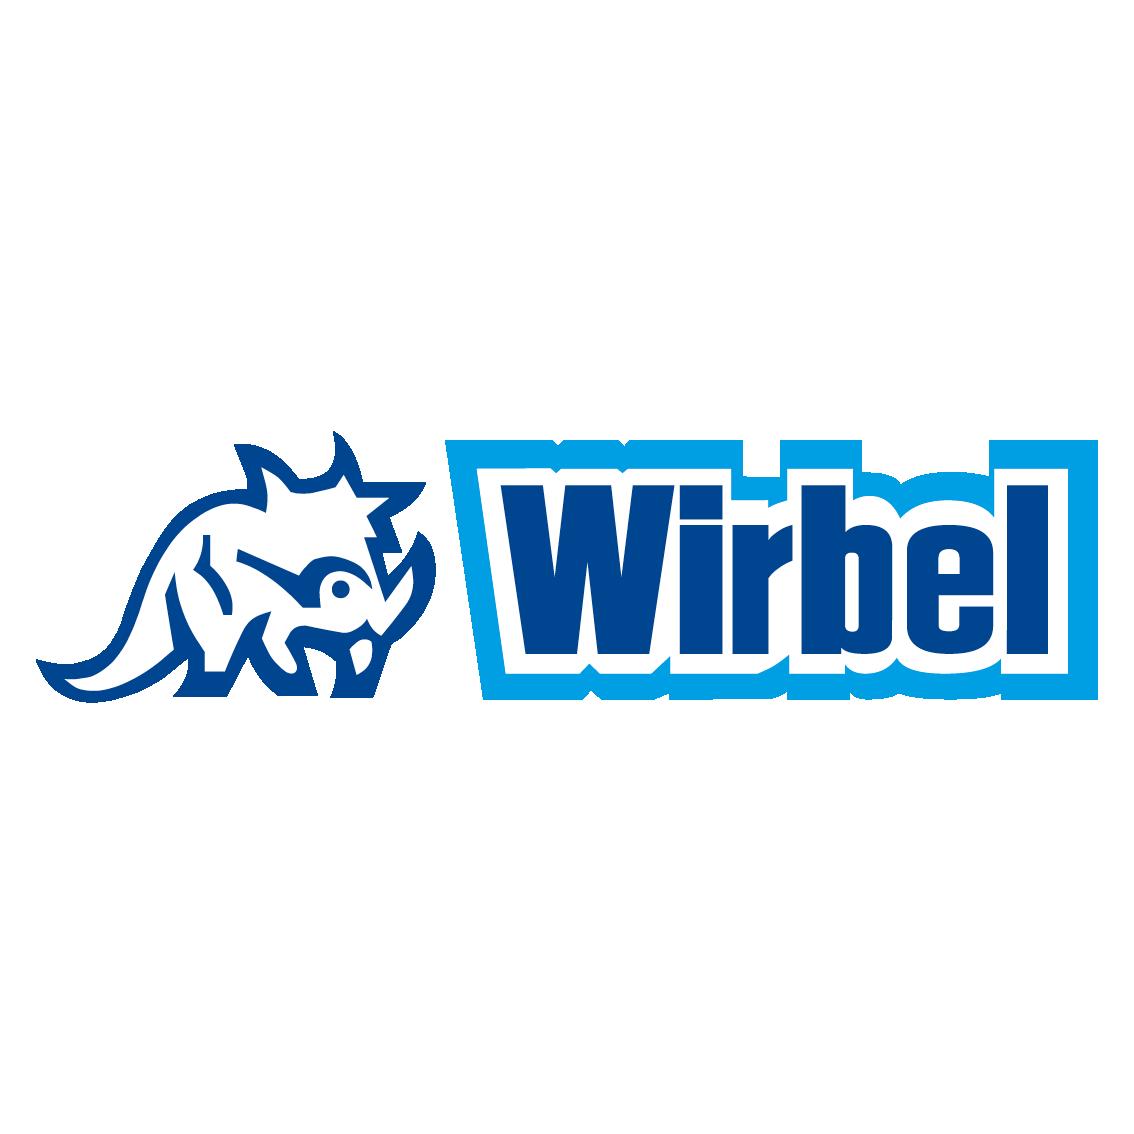 panta chimica catalogo wirbel